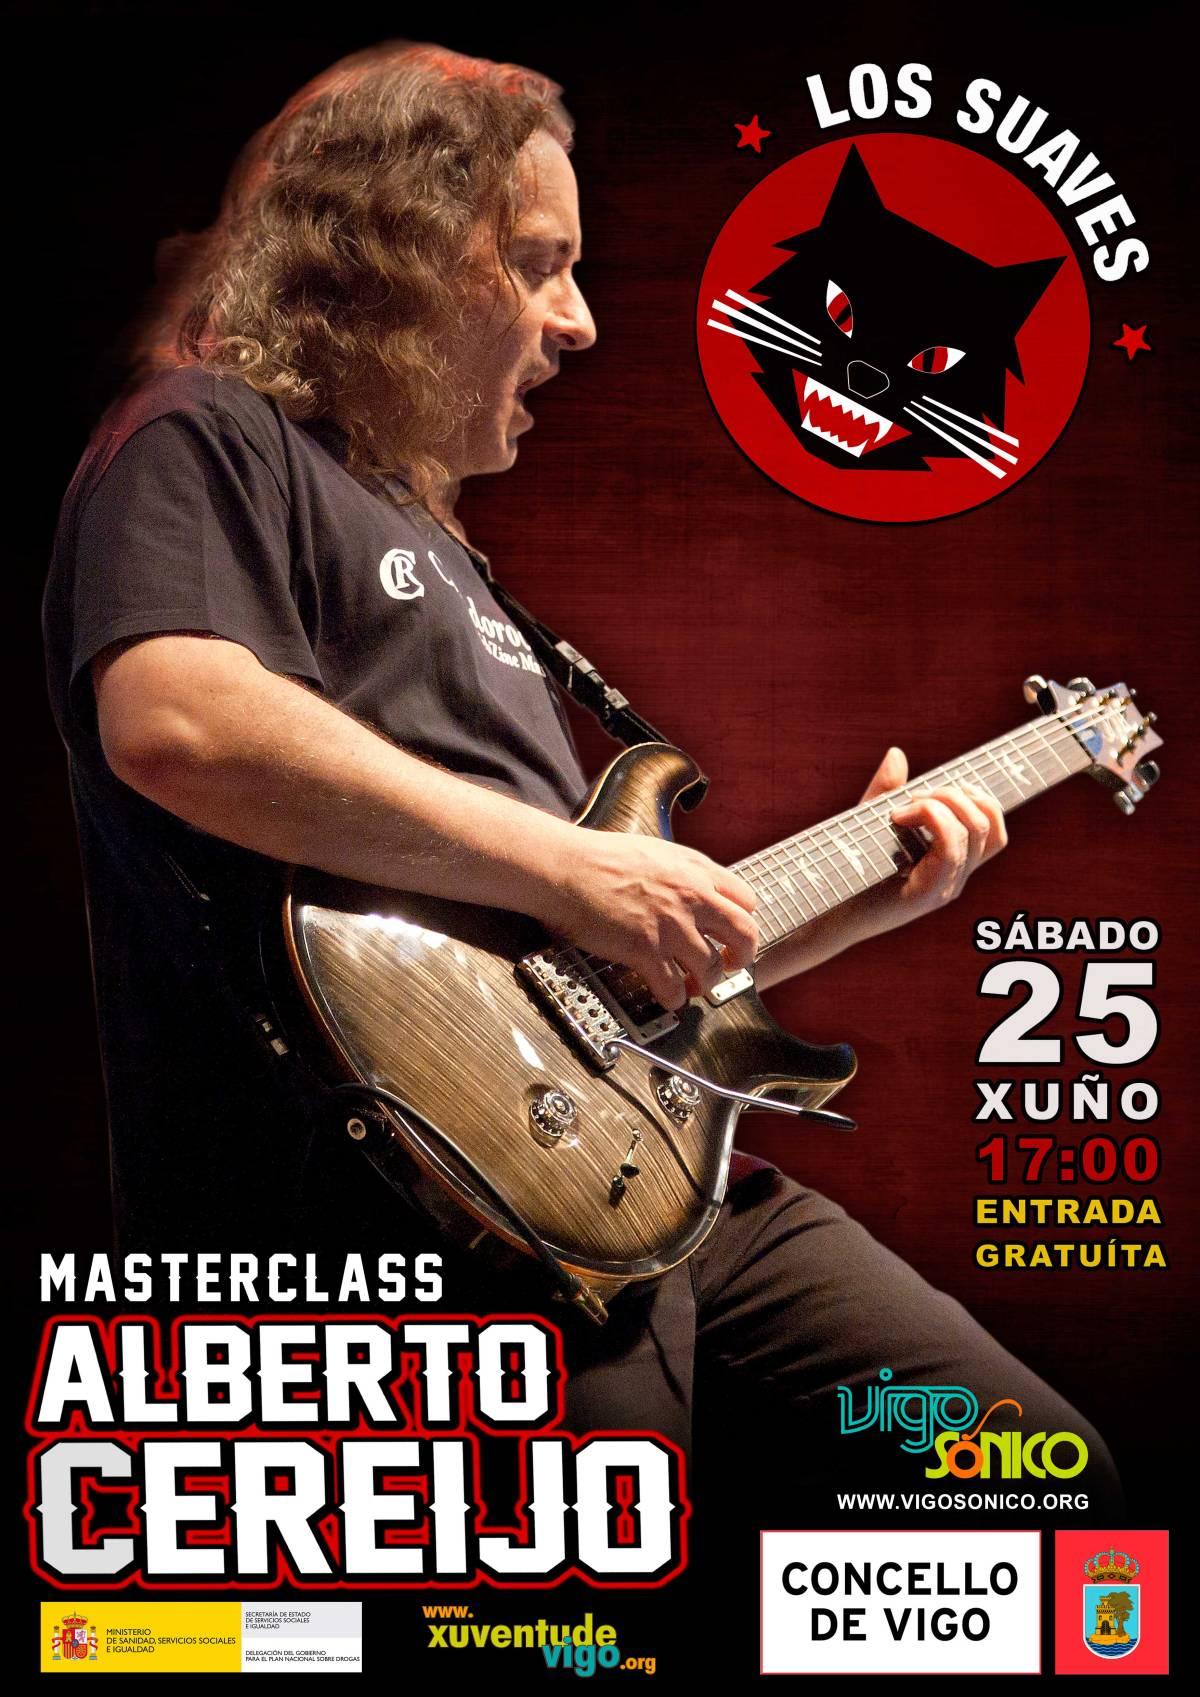 Master Class: Alberto Cereijo de LosSuaves.